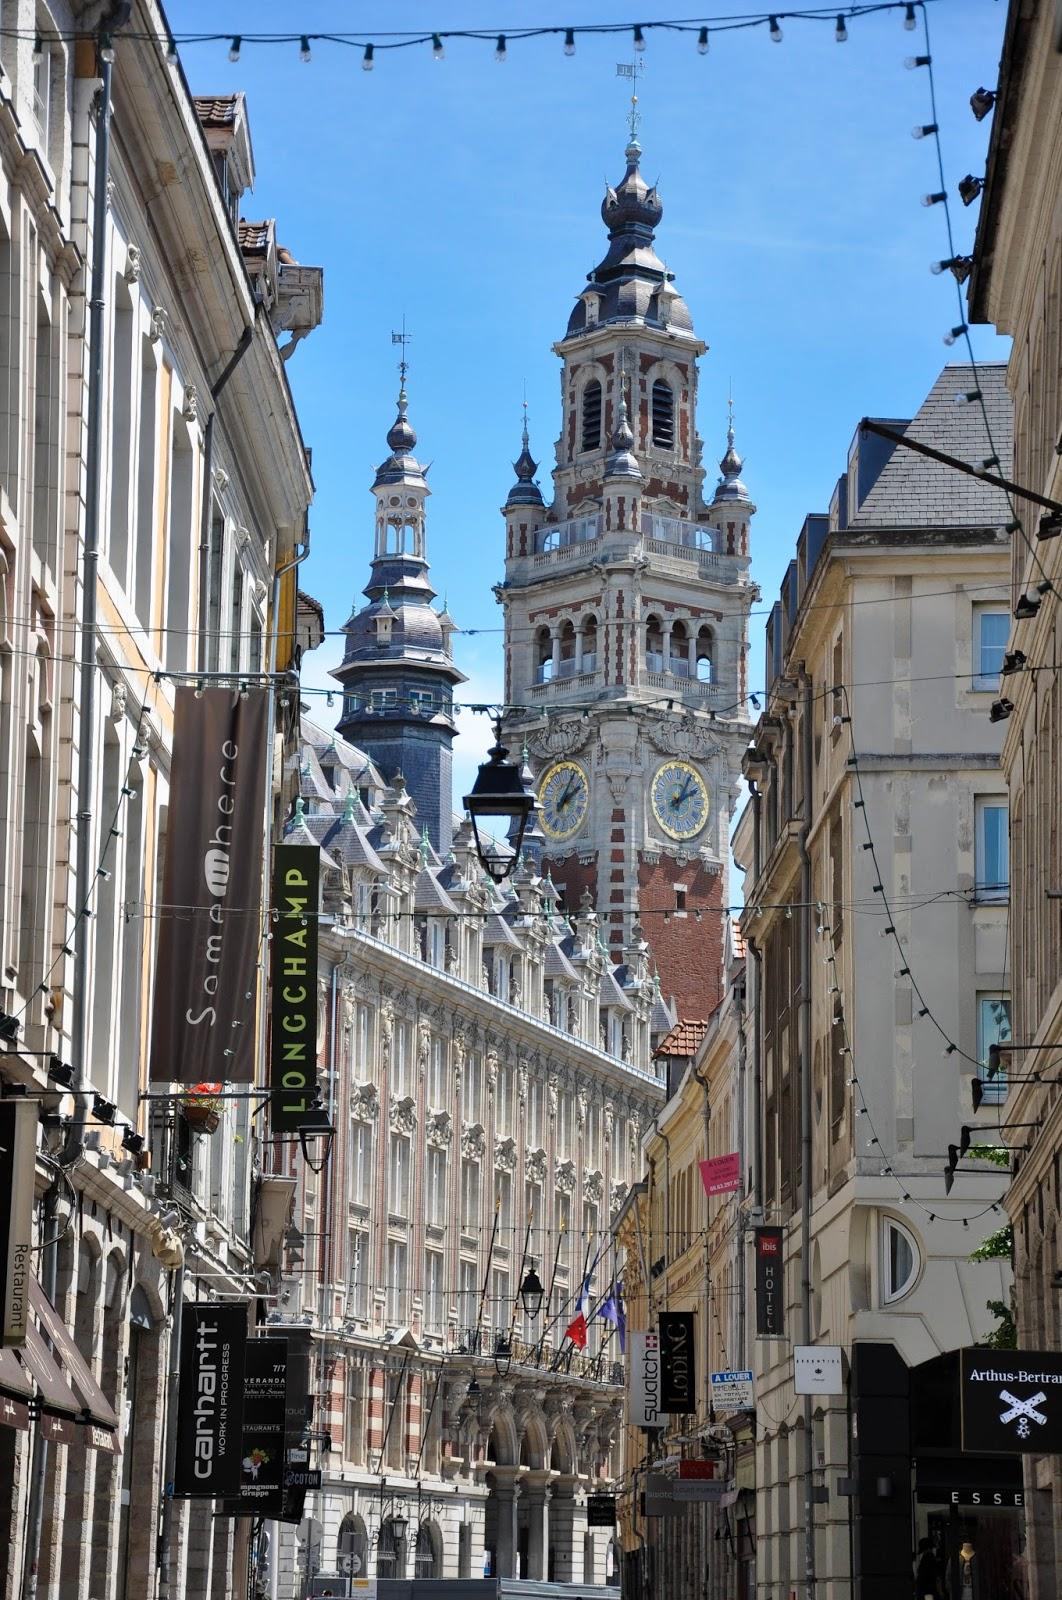 Clocktower, Lille, France